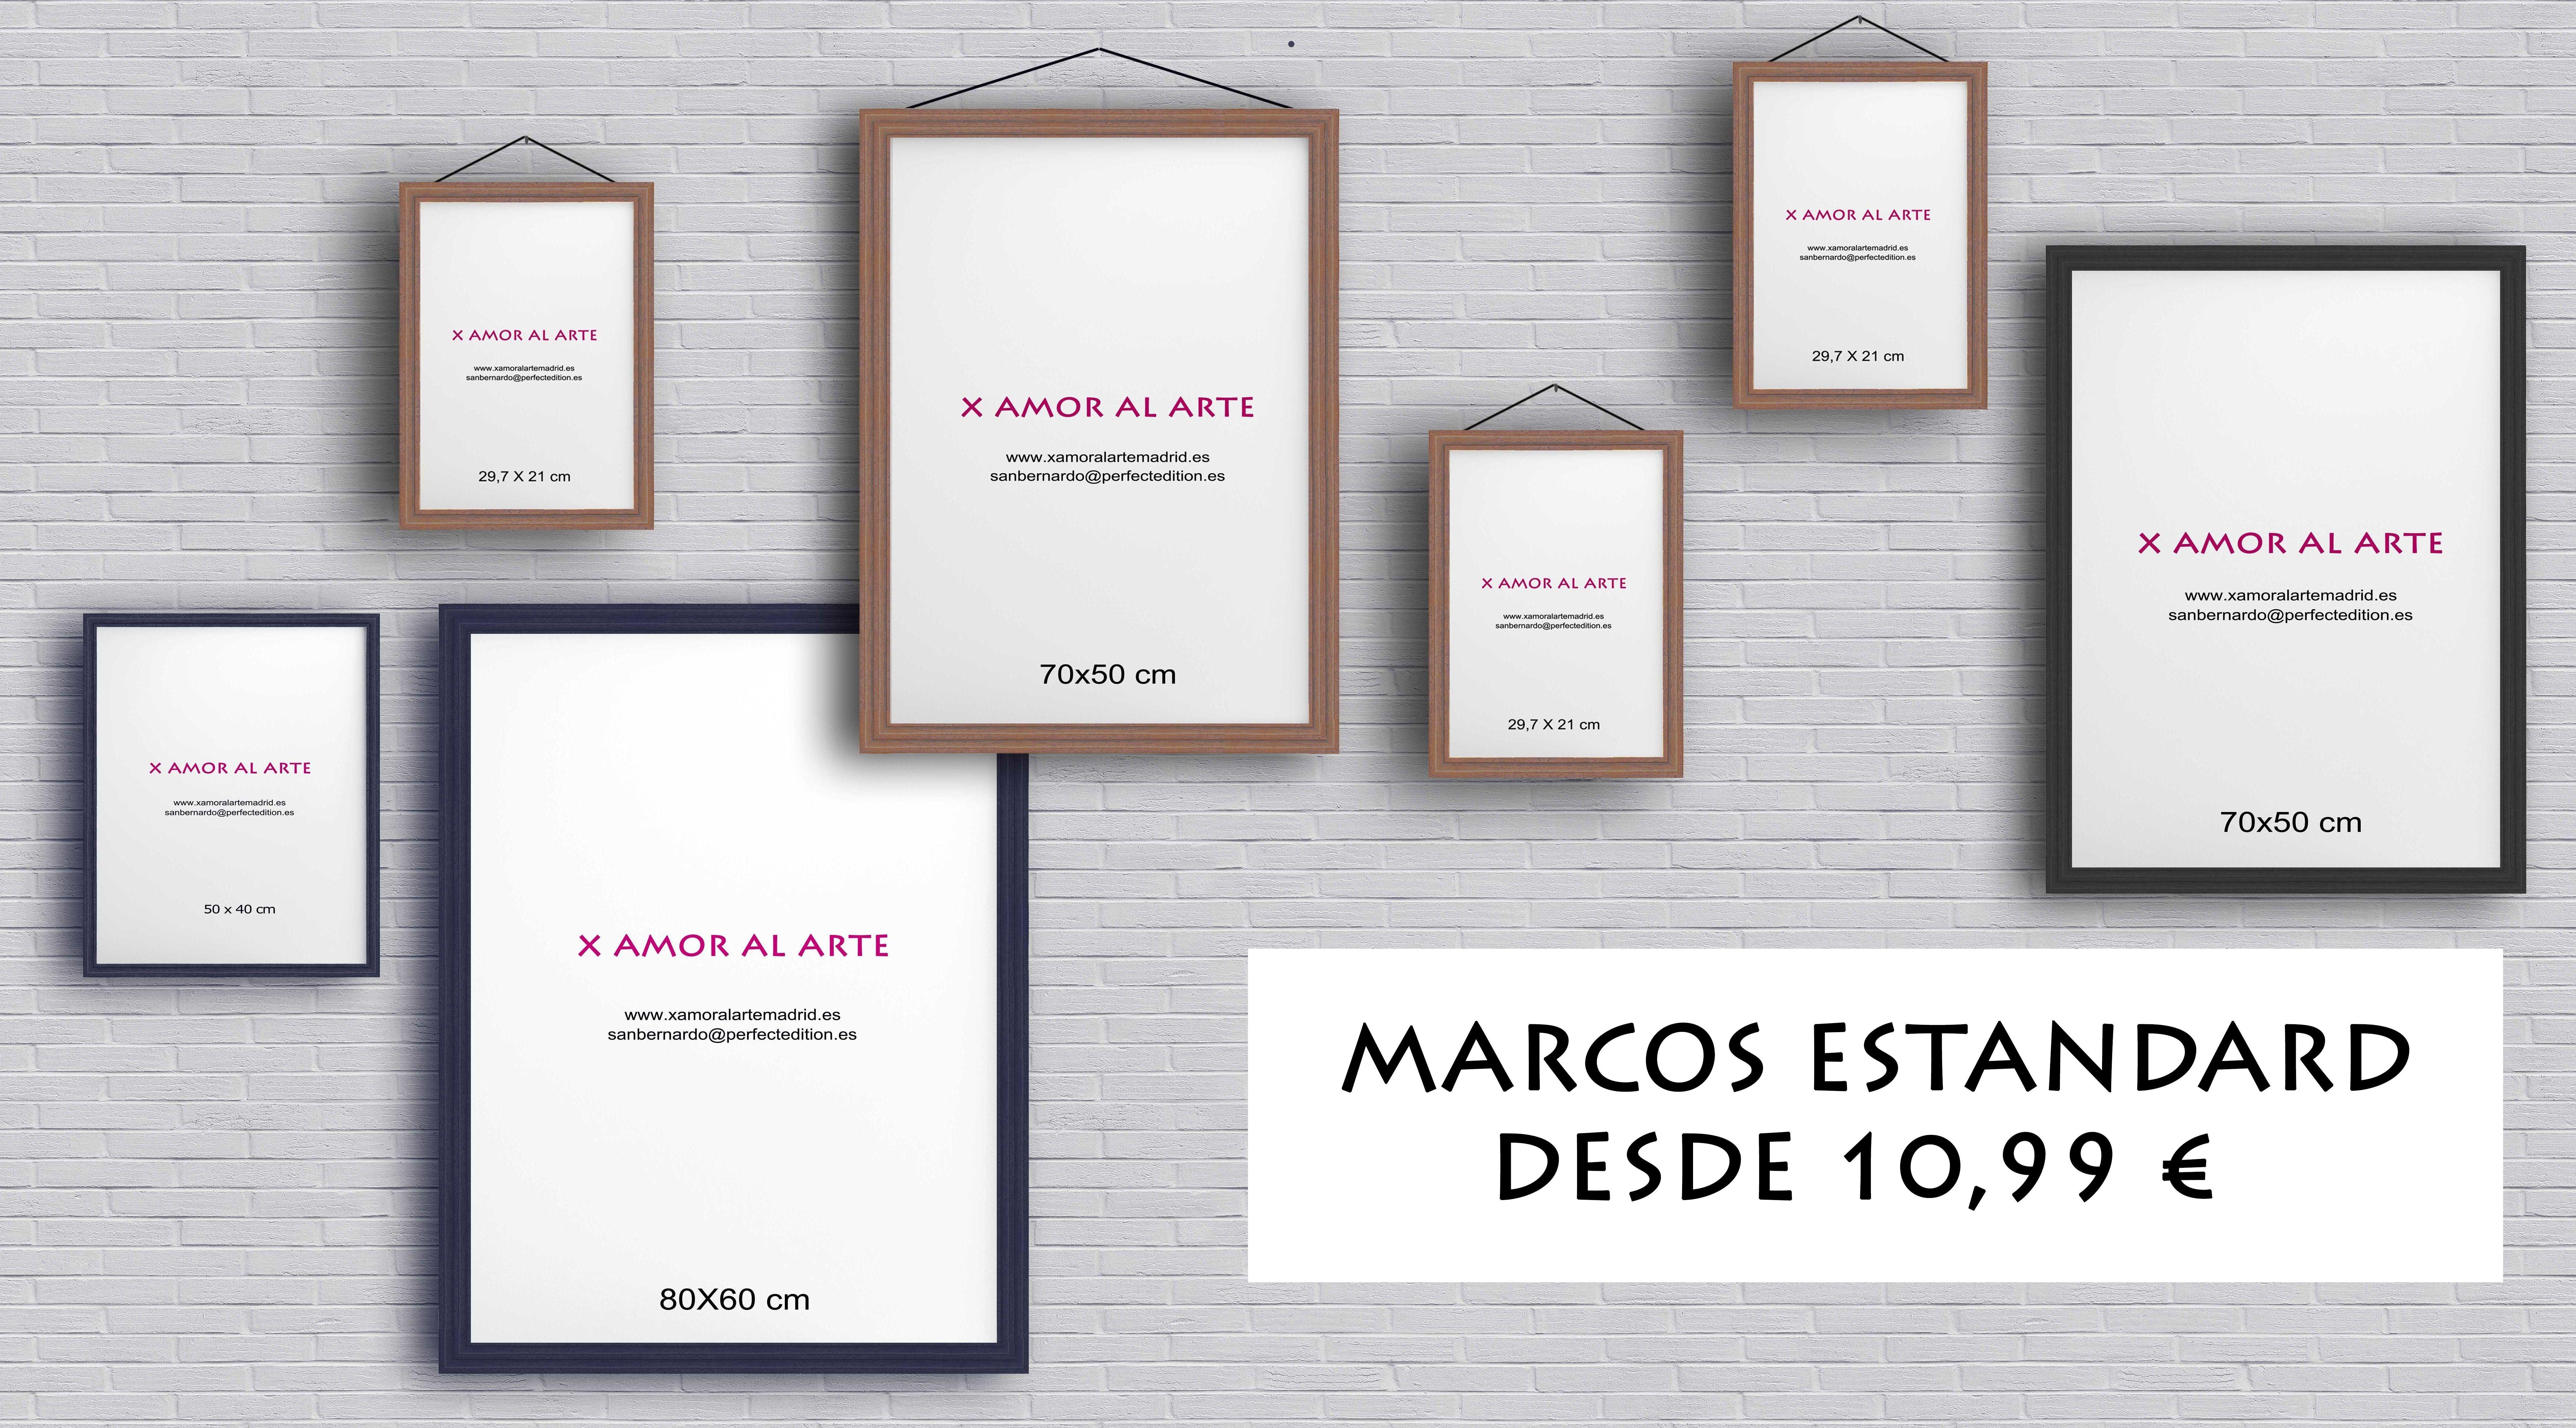 Oferta marcos estandard: Catálogo de X Amor Al Arte